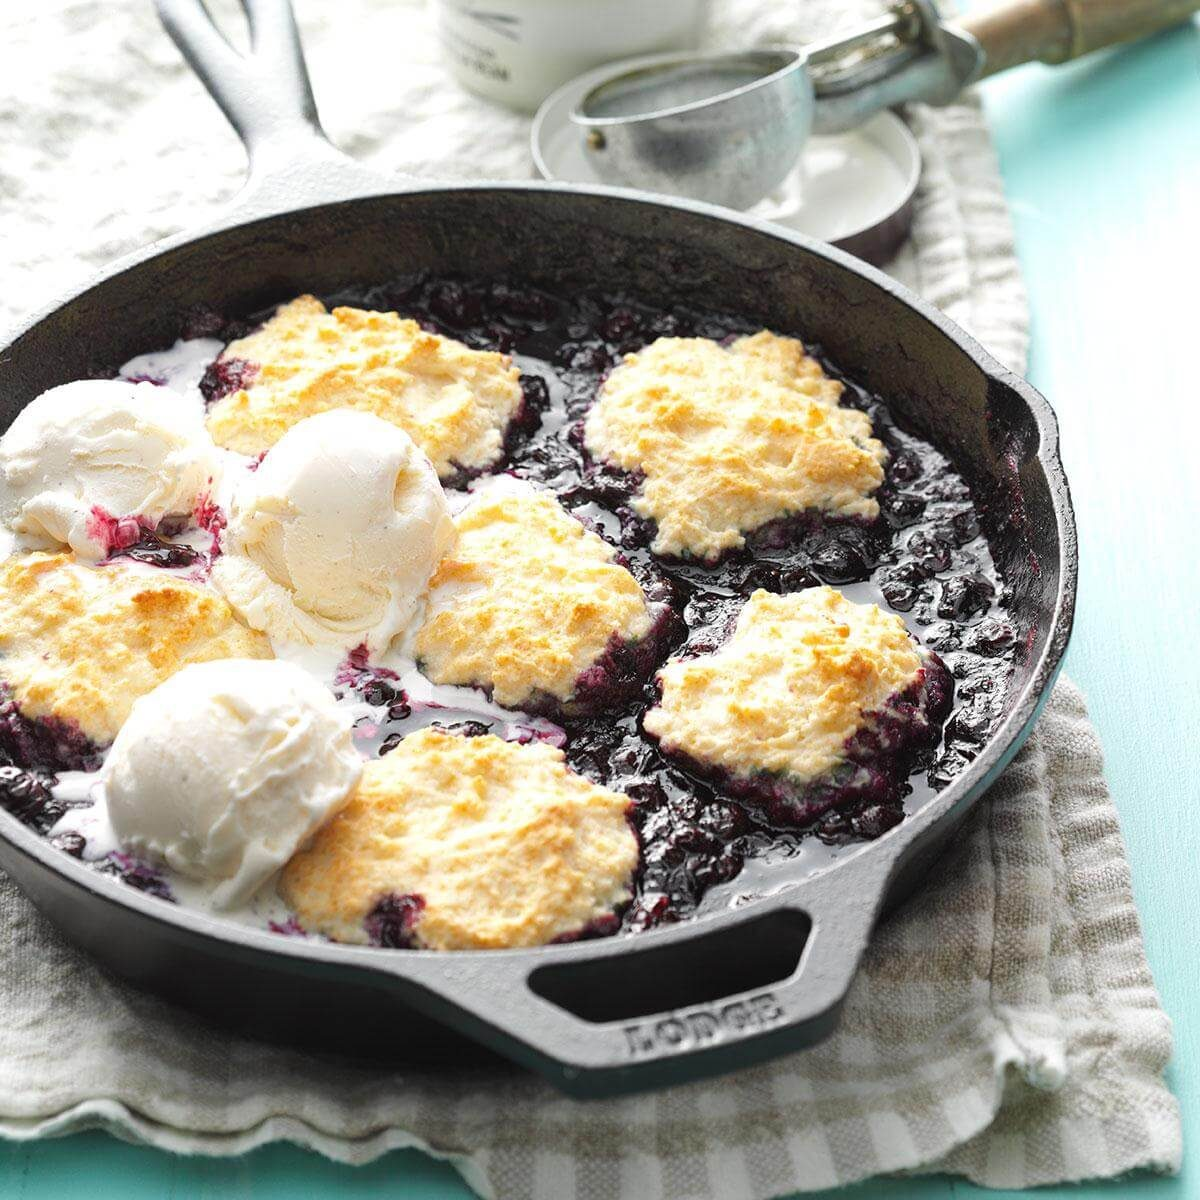 64 Fantastic Blueberry Dessert Recipes